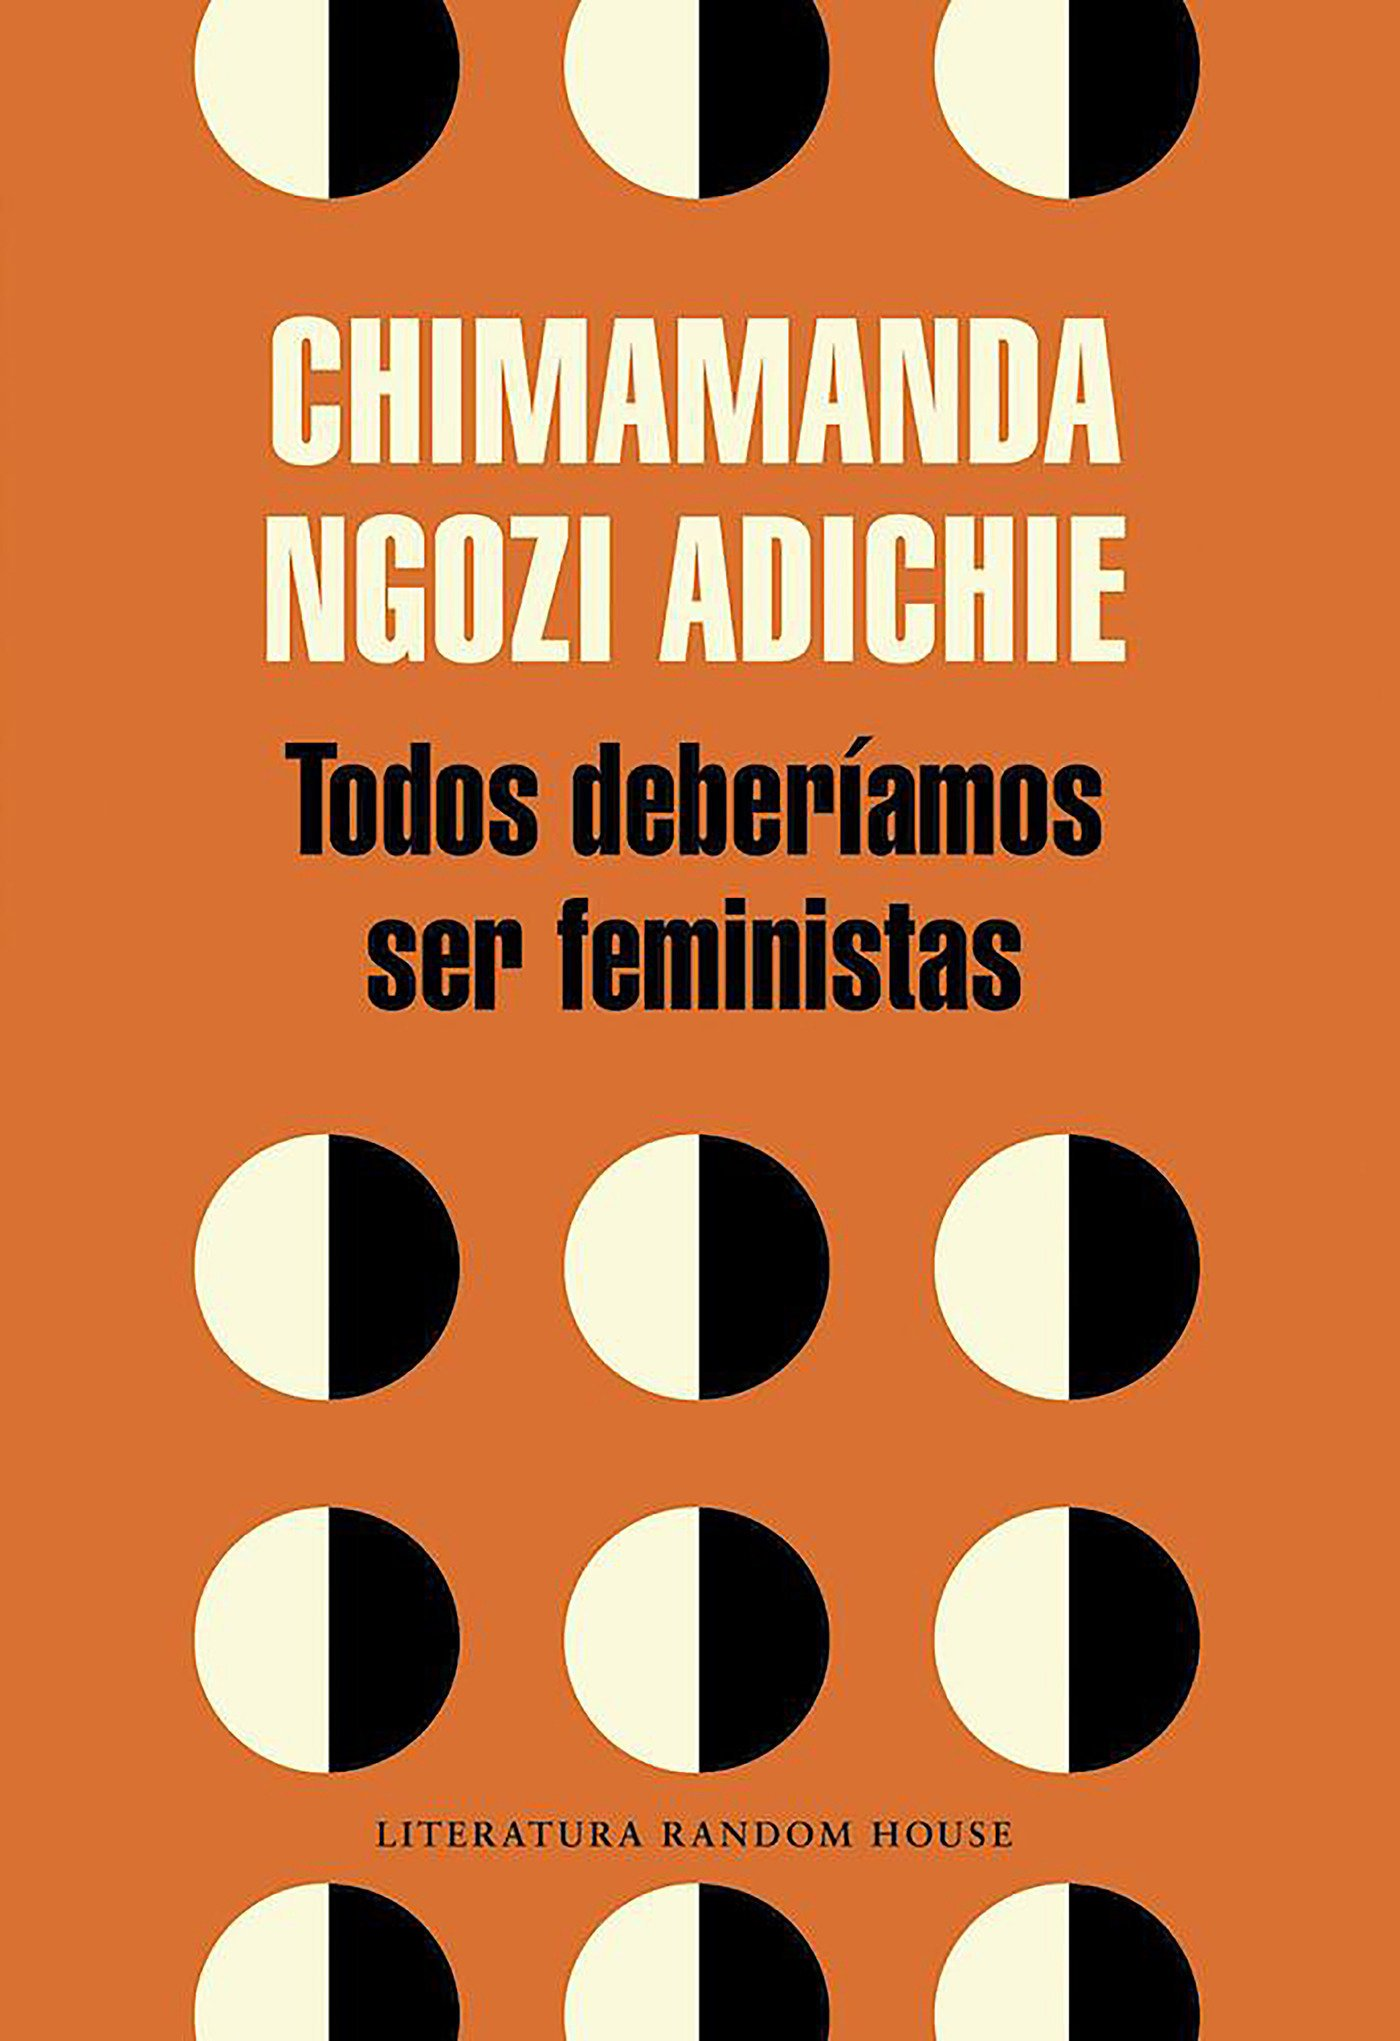 Todos deberíamos ser feministas (Literatura Random House) Tapa blanda – 3 sep 2015 Chimamanda Ngozi Adichie L.R.house 8439730489 Feminism